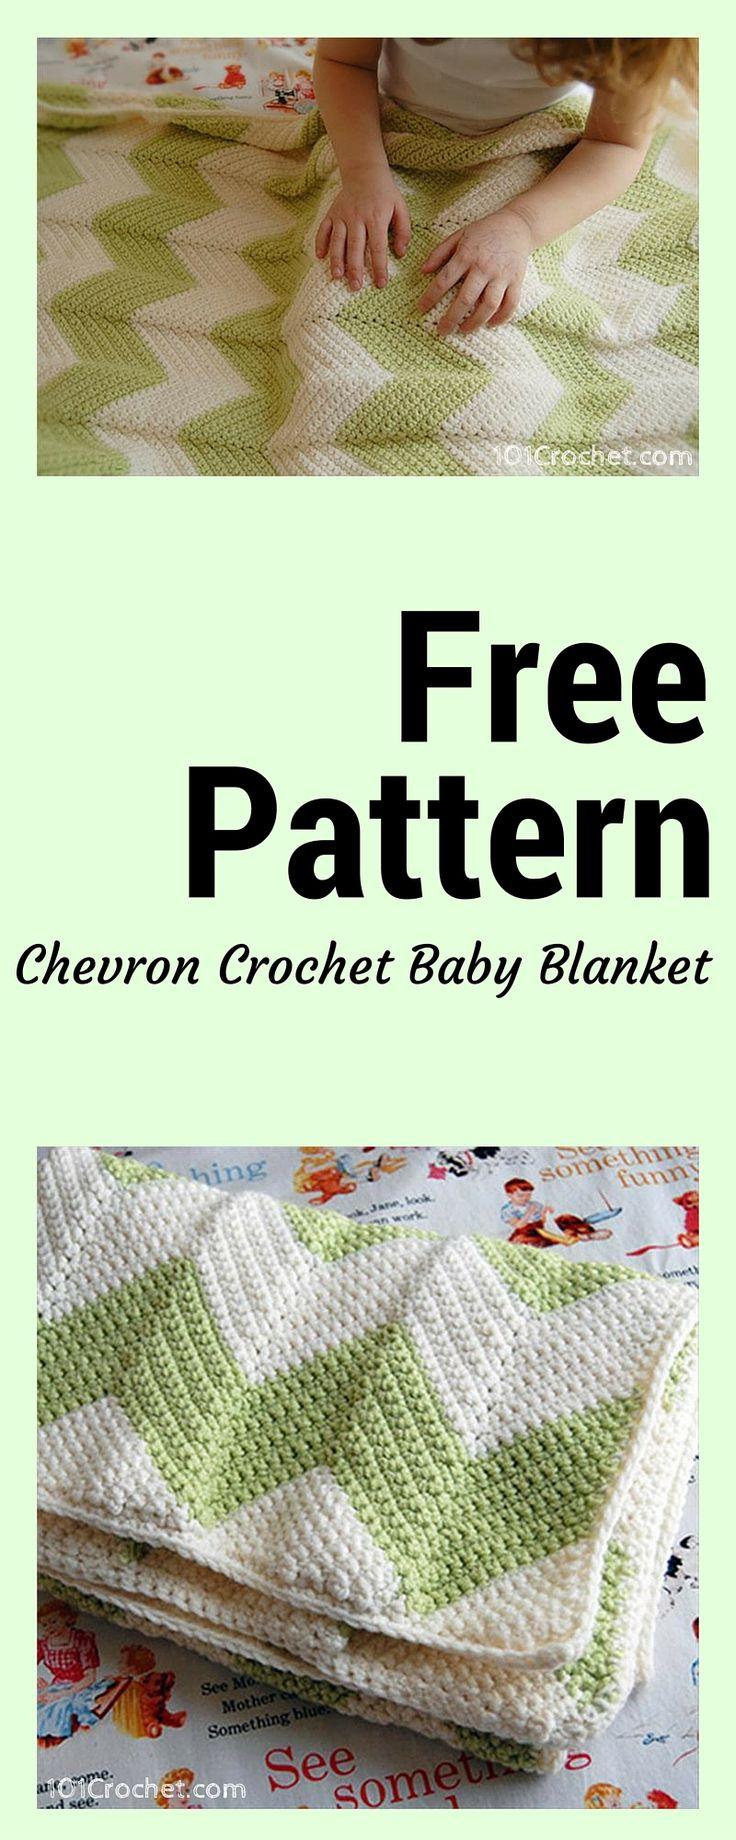 Free Chevron Crochet Baby Blanket Pattern - 101 Crochet - #freecrochetpatterns